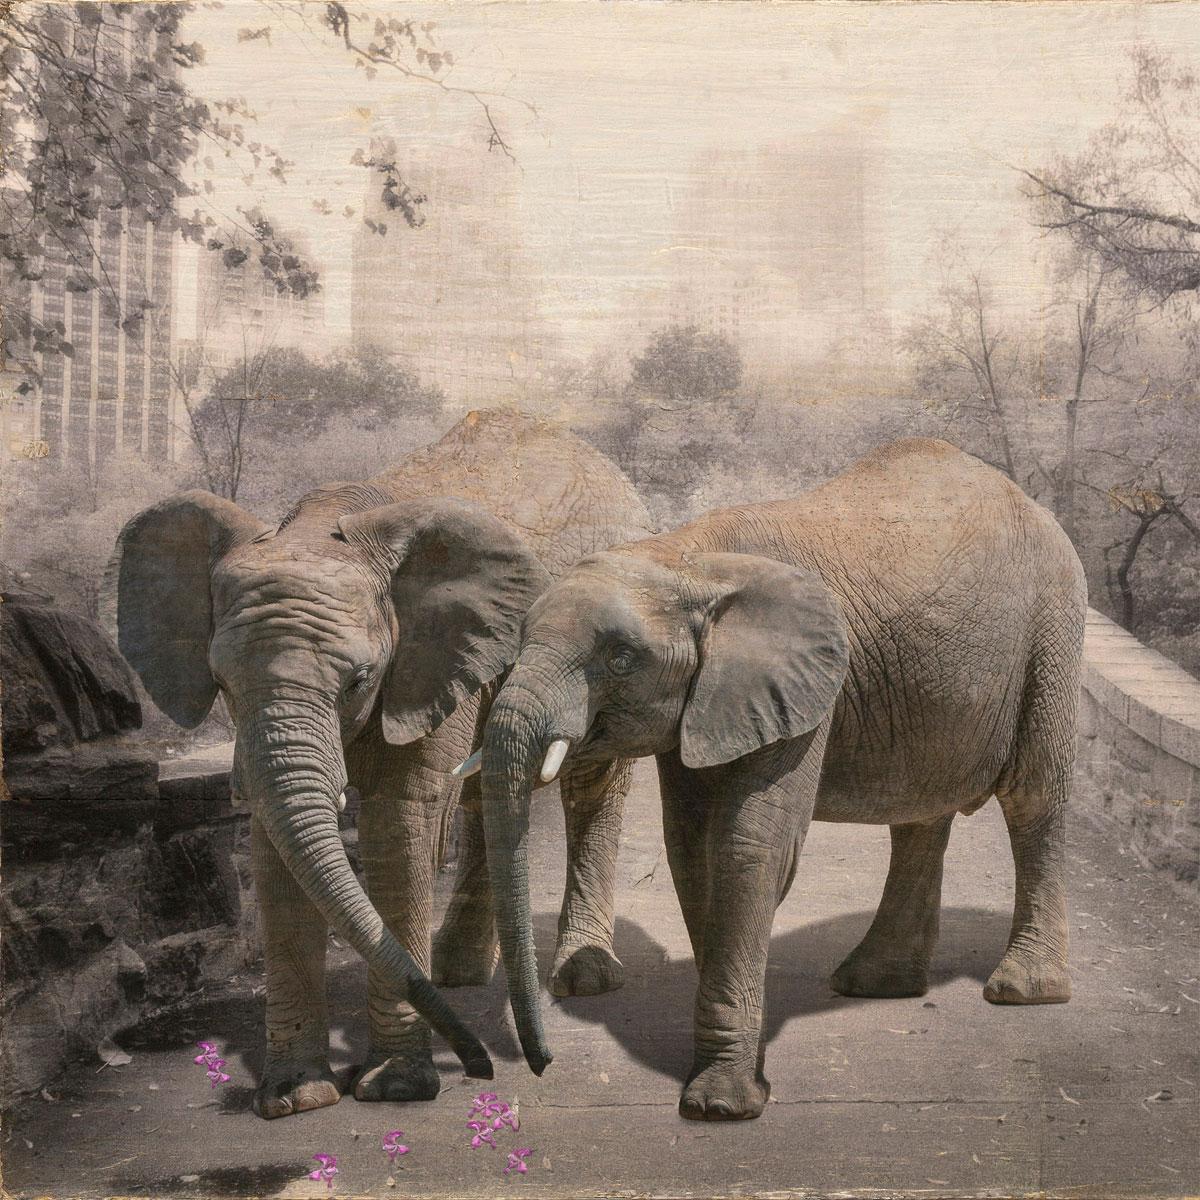 Suavitatem by Sondra Wampler